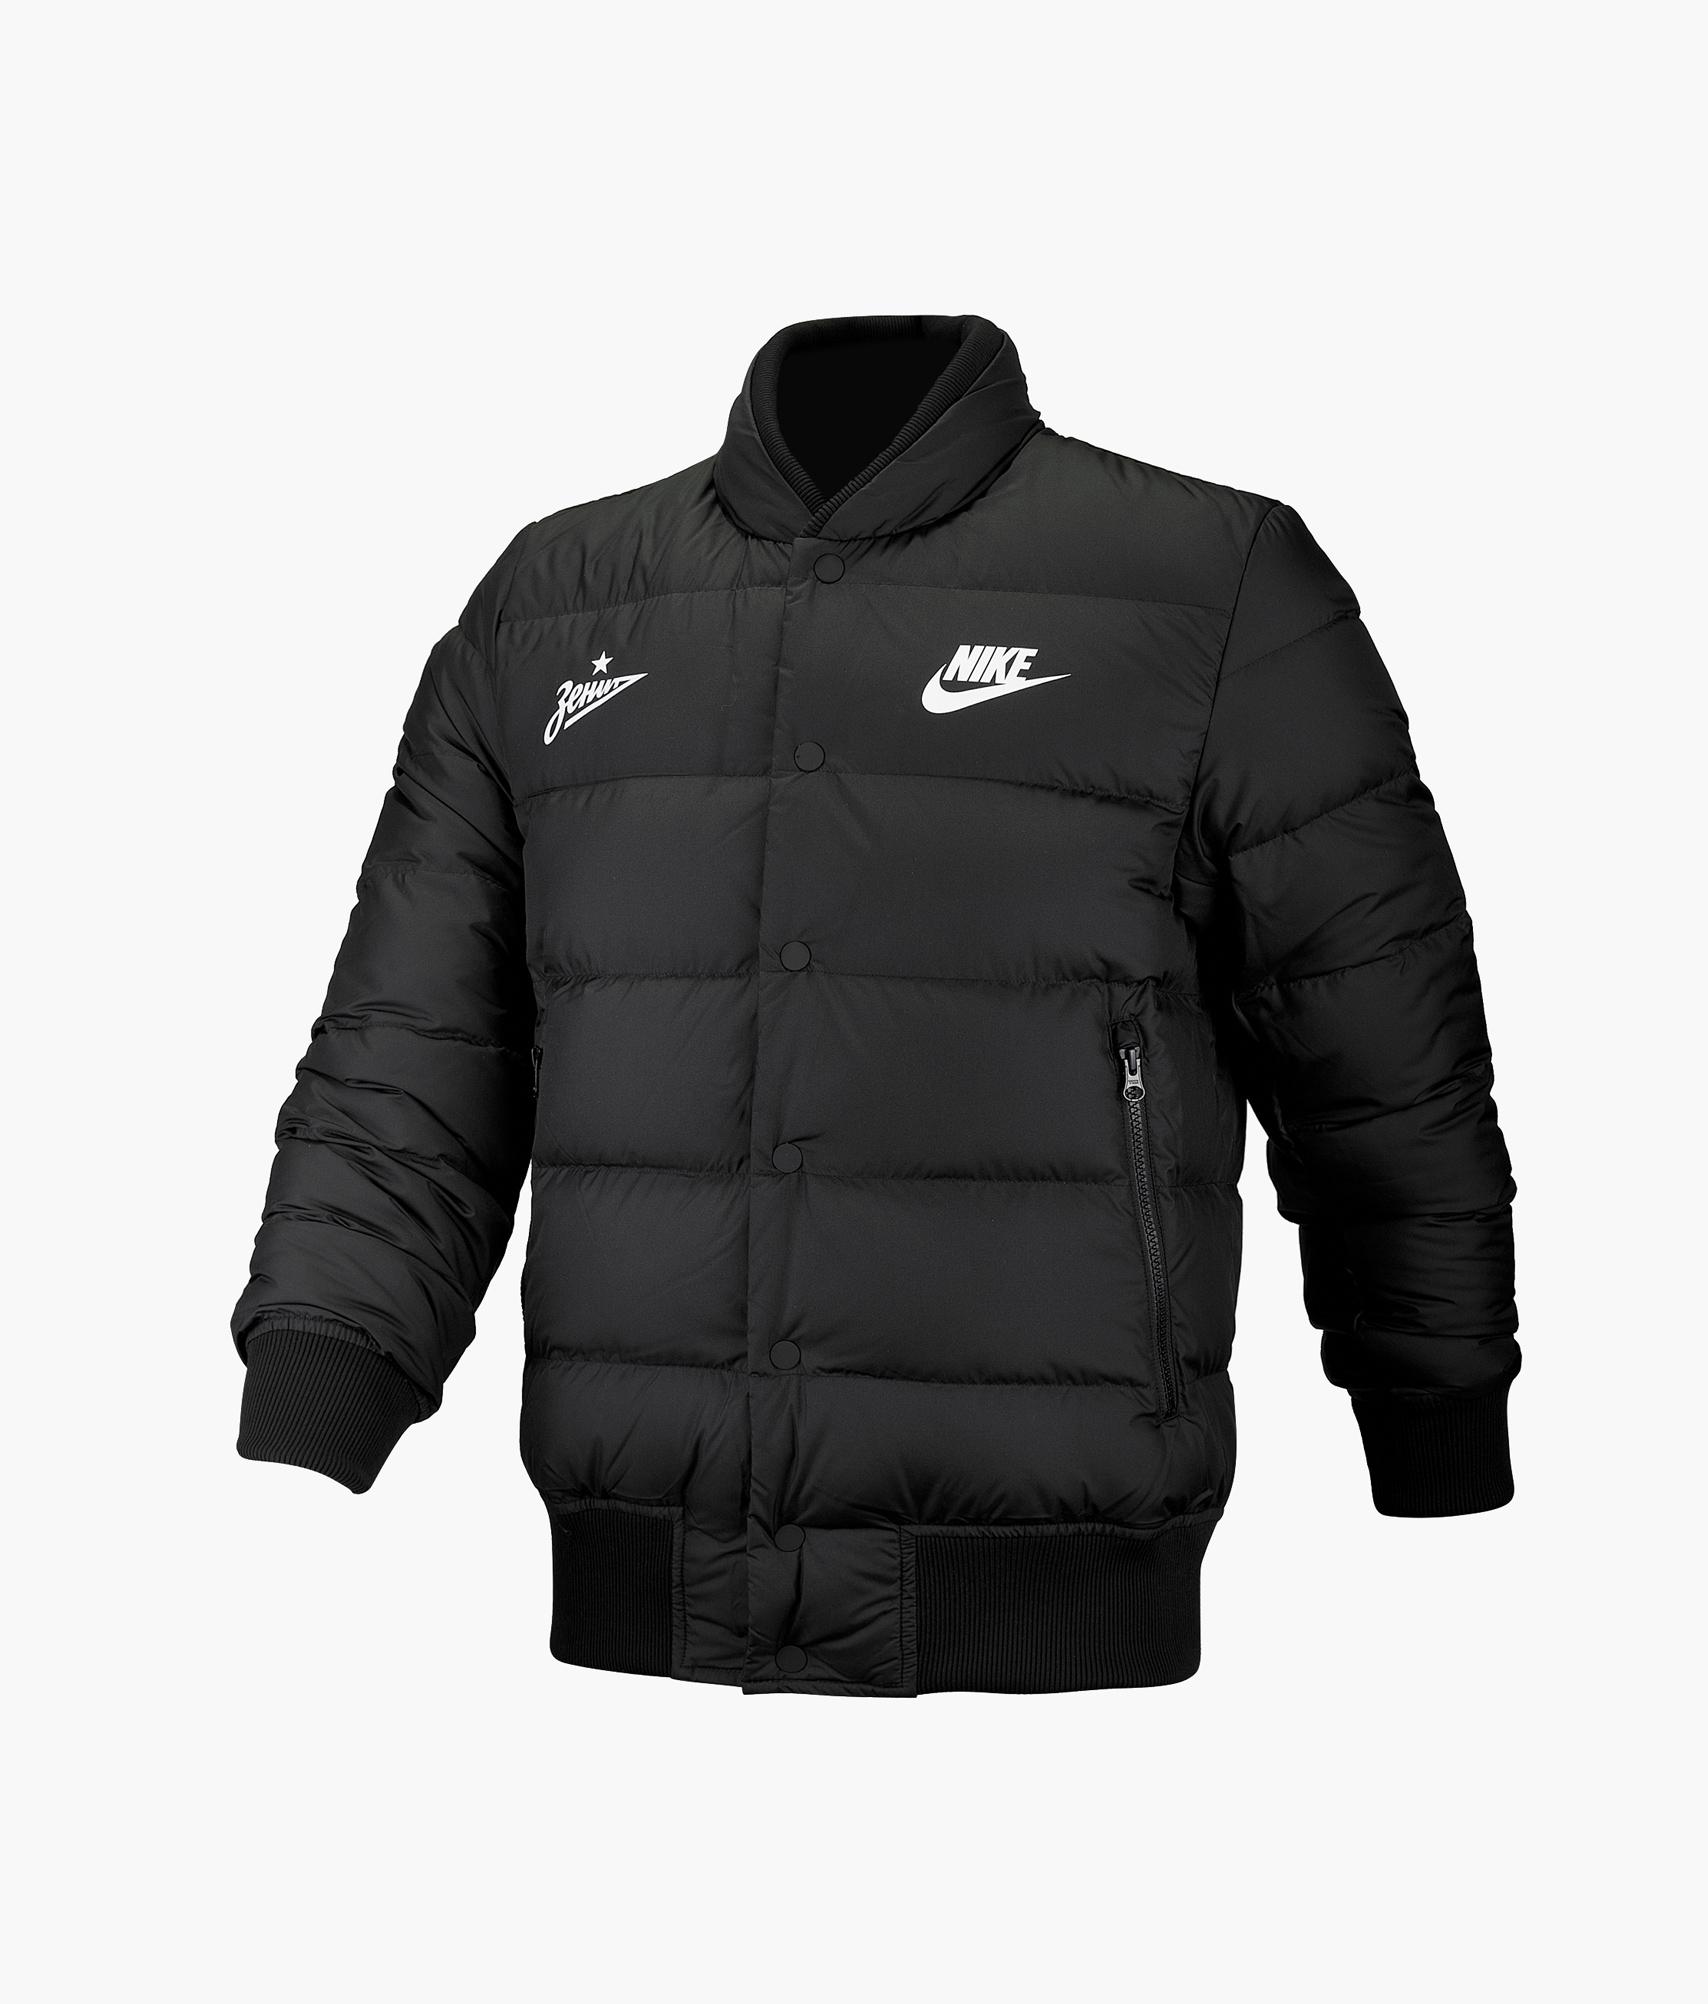 Пуховик-бомбер Nike Nike Цвет-Черный